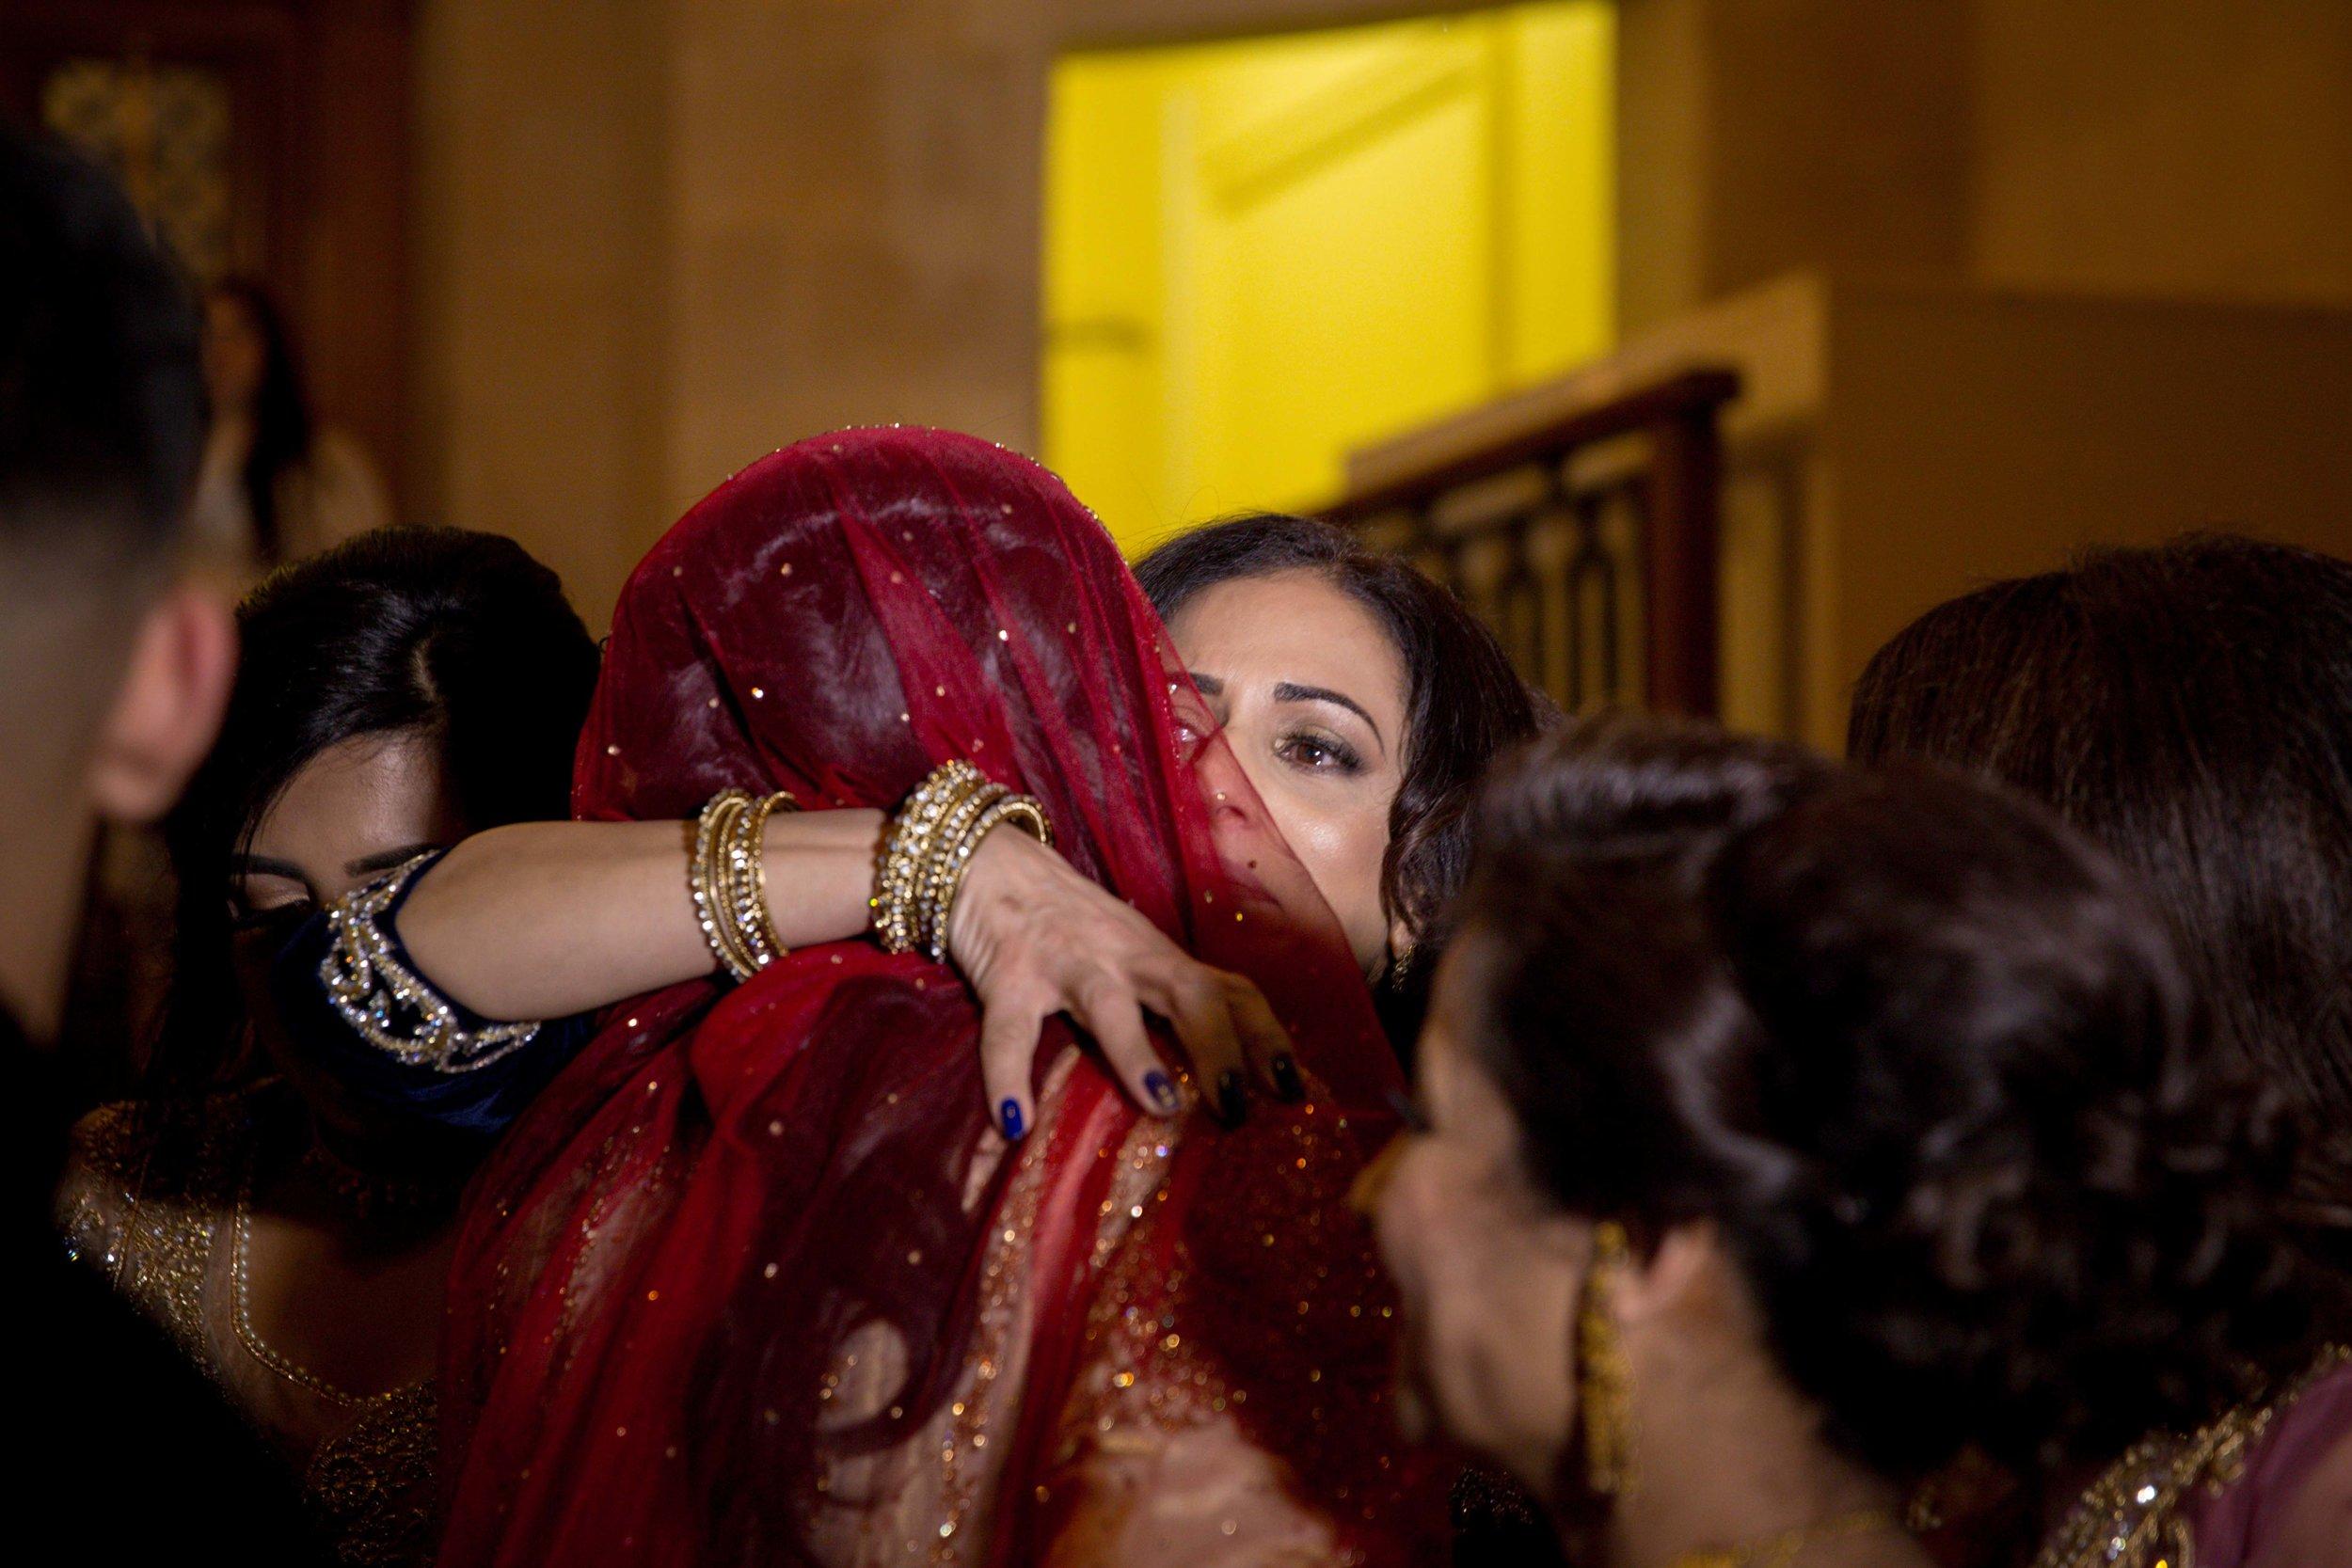 Female-asian-wedding-photographer-Cardiff-City-Hall-natalia-smith-photography-50.jpg